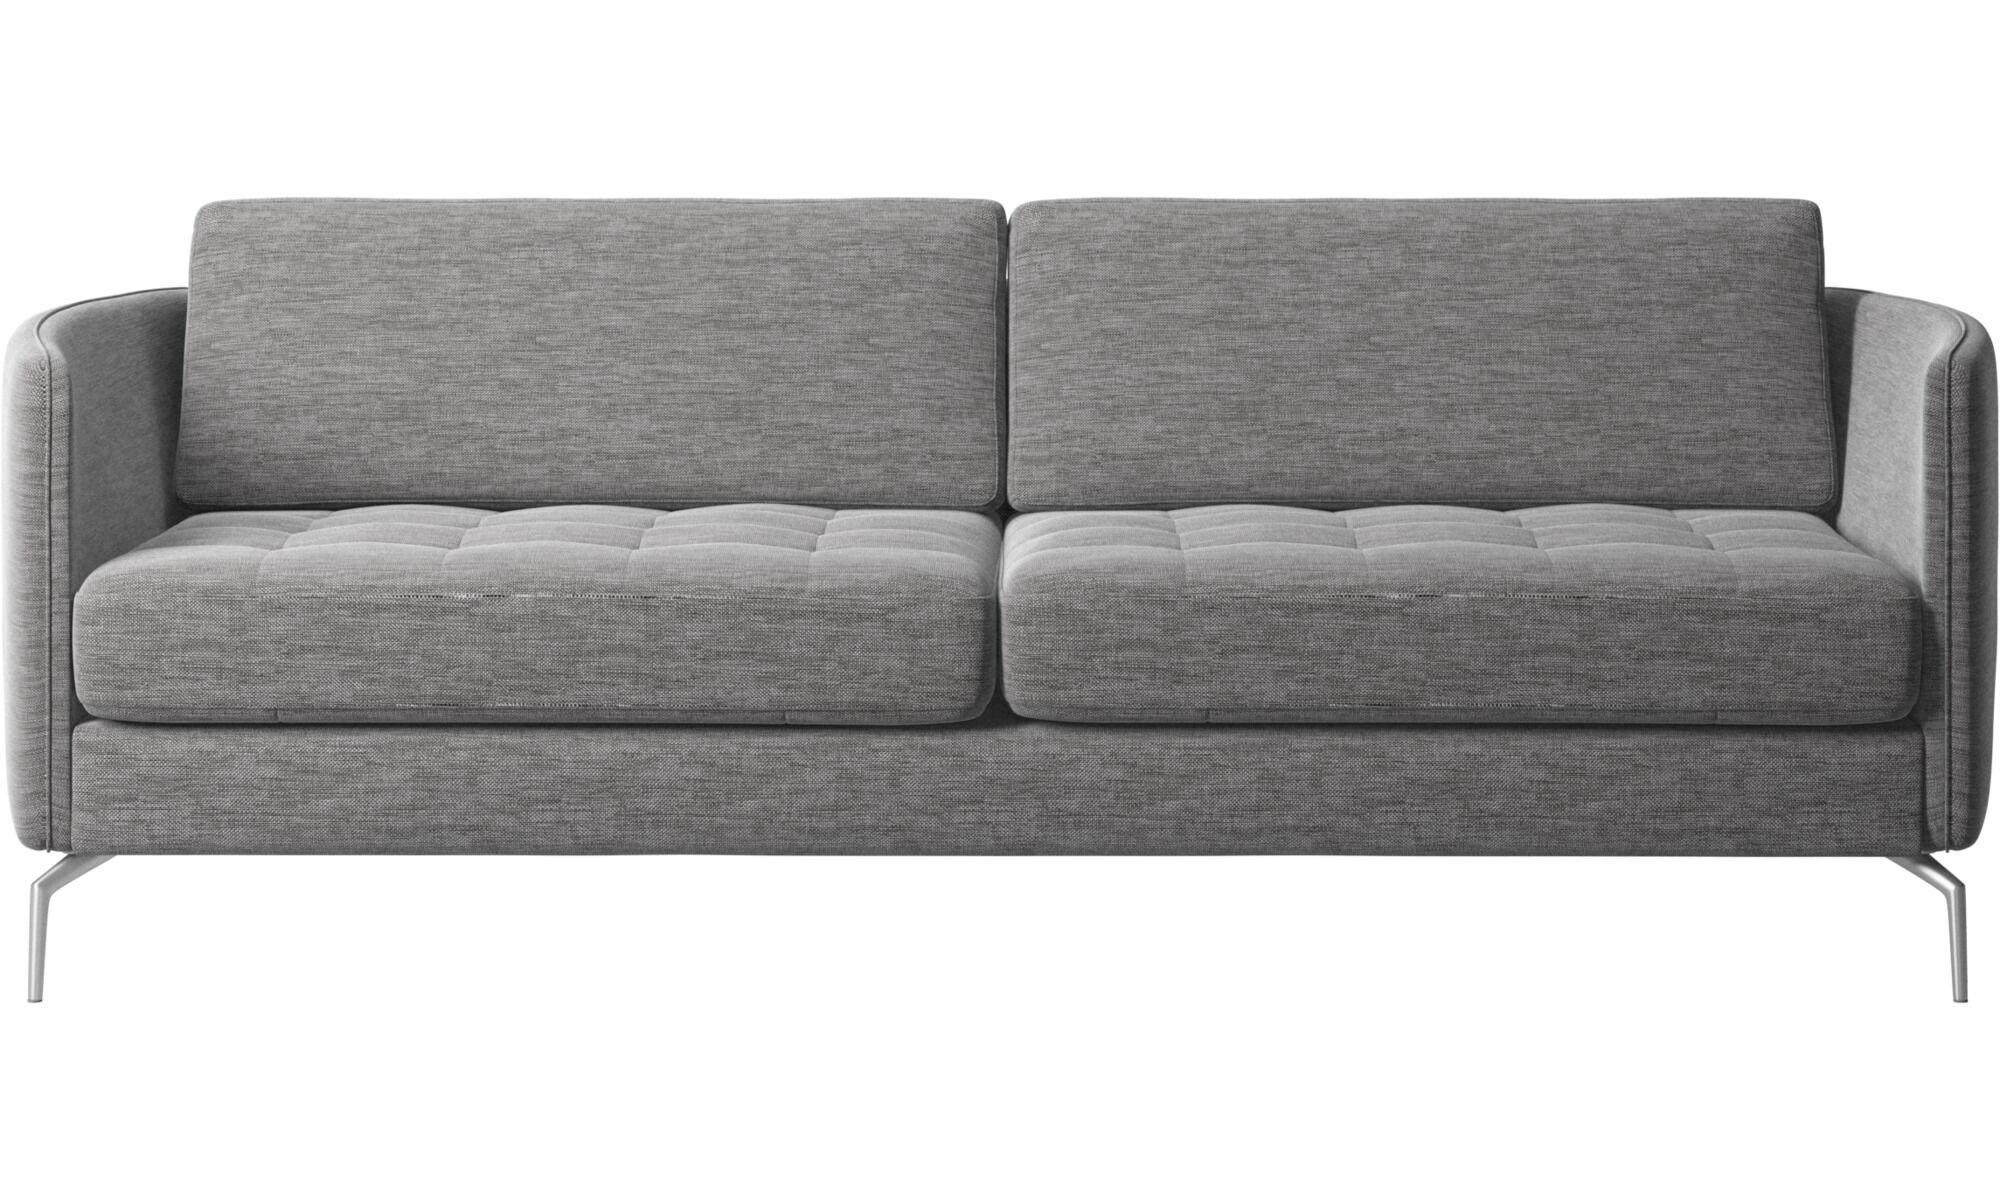 fundas para sofas en lugo white bonded leather sectional sofa de la coleccion boconcept 2 plazas y media osaka asiento capitone gris